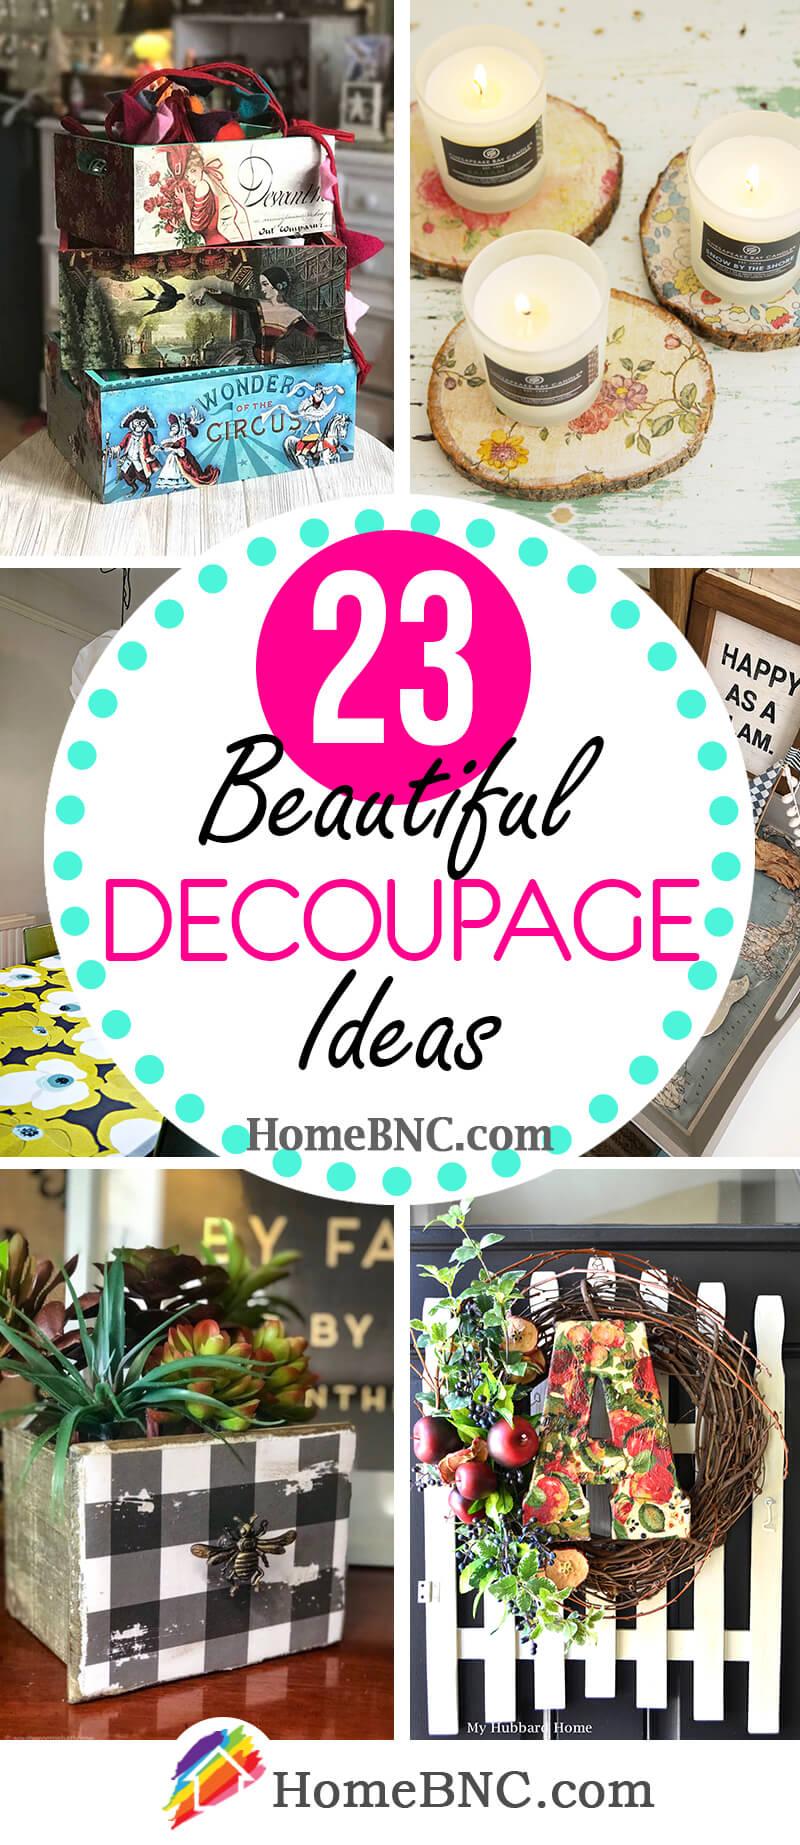 Decoupage Ideas